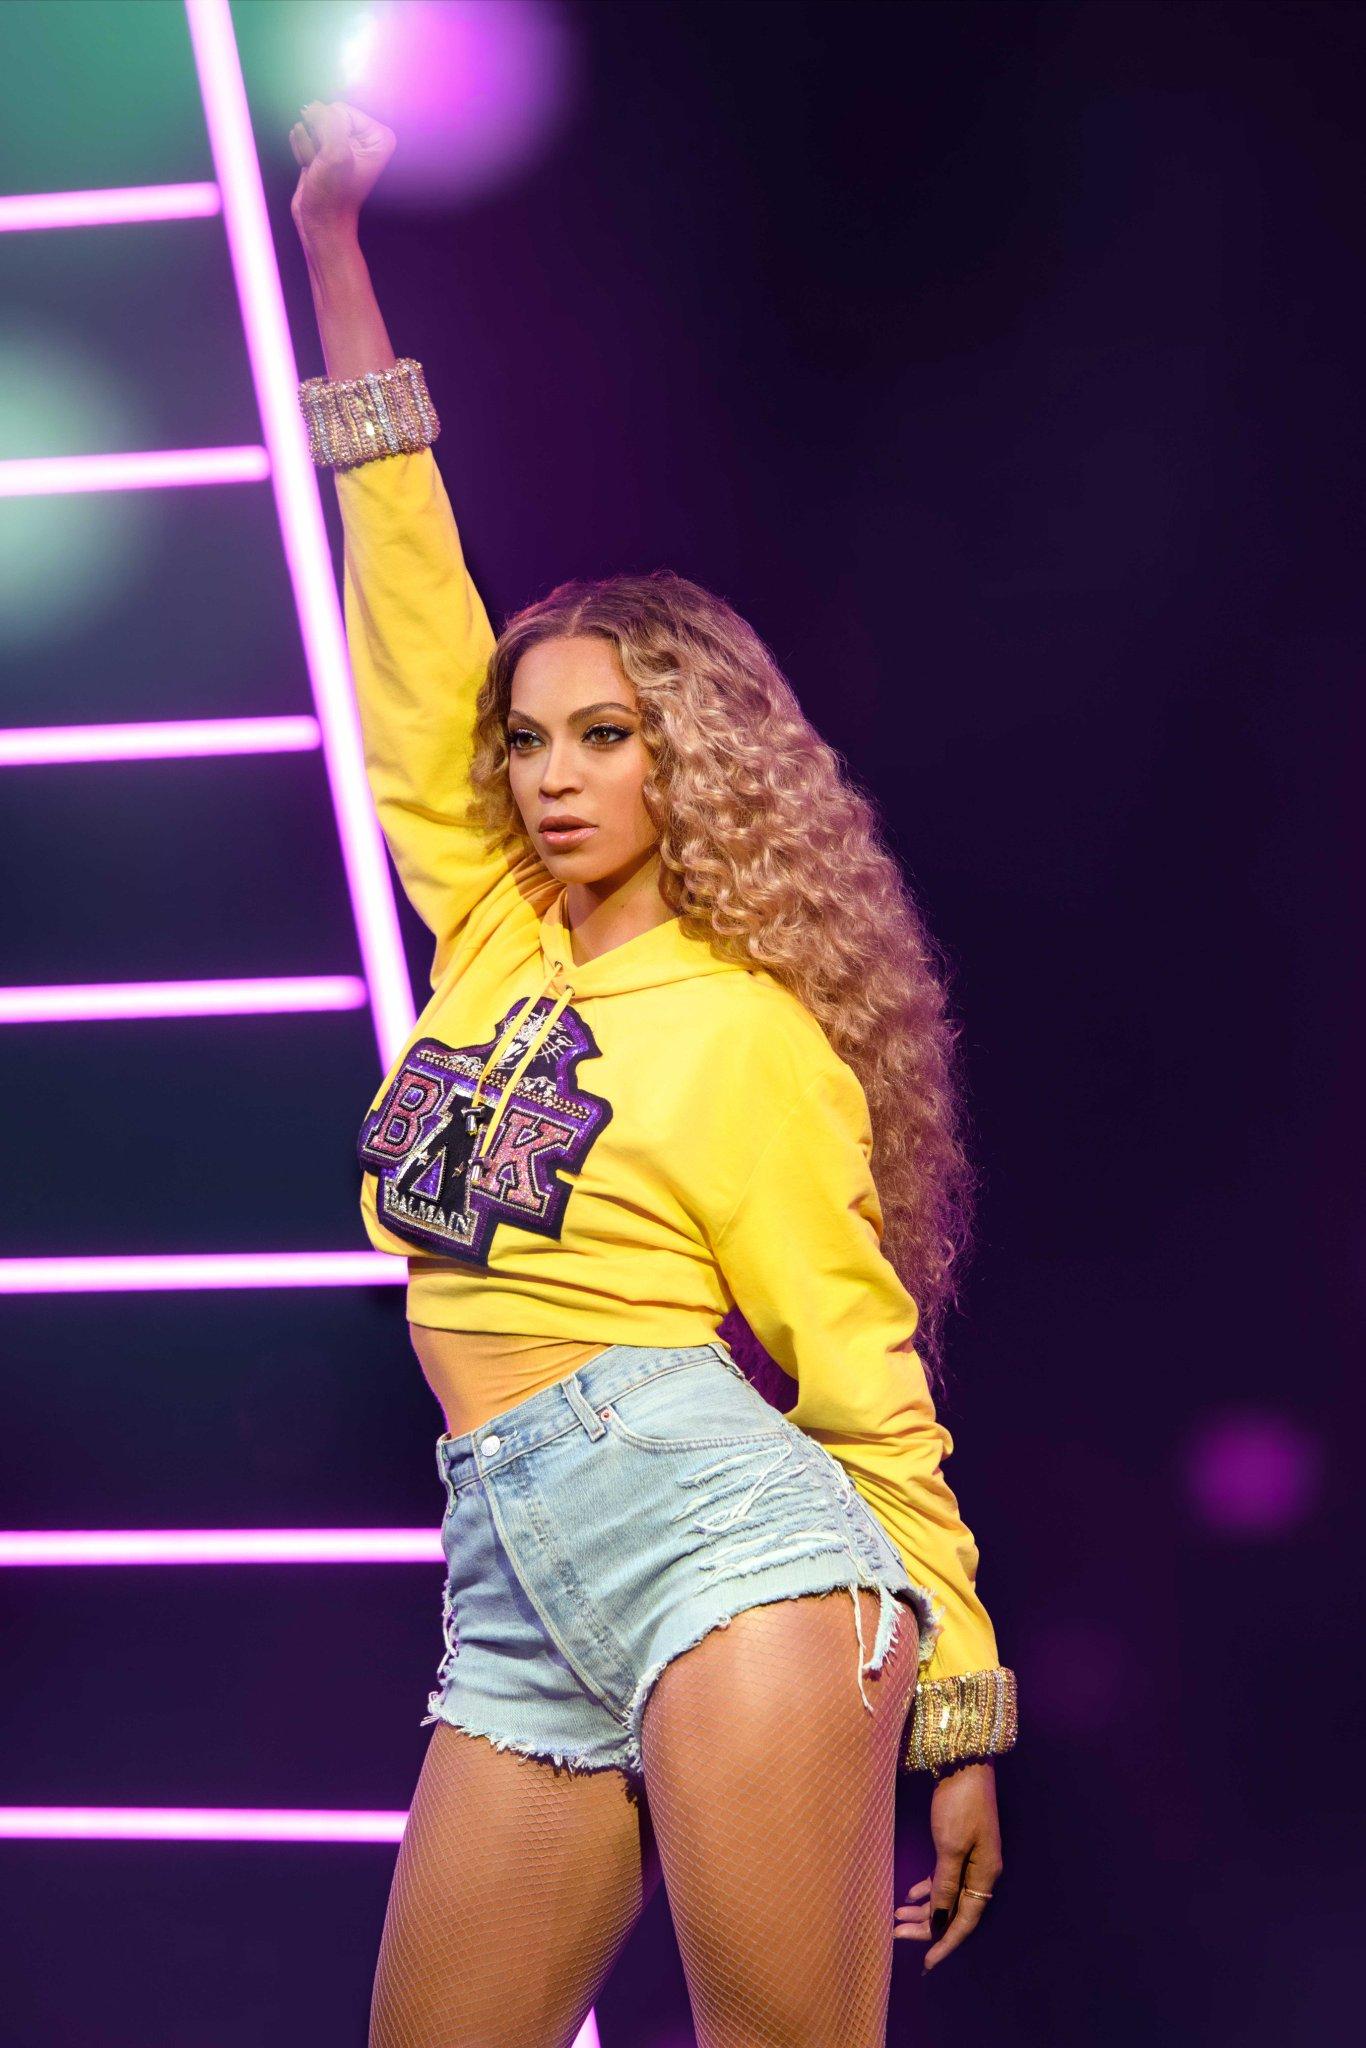 Can you believe Beyoncé is 40 today? Happy Birthday Queen Bey!